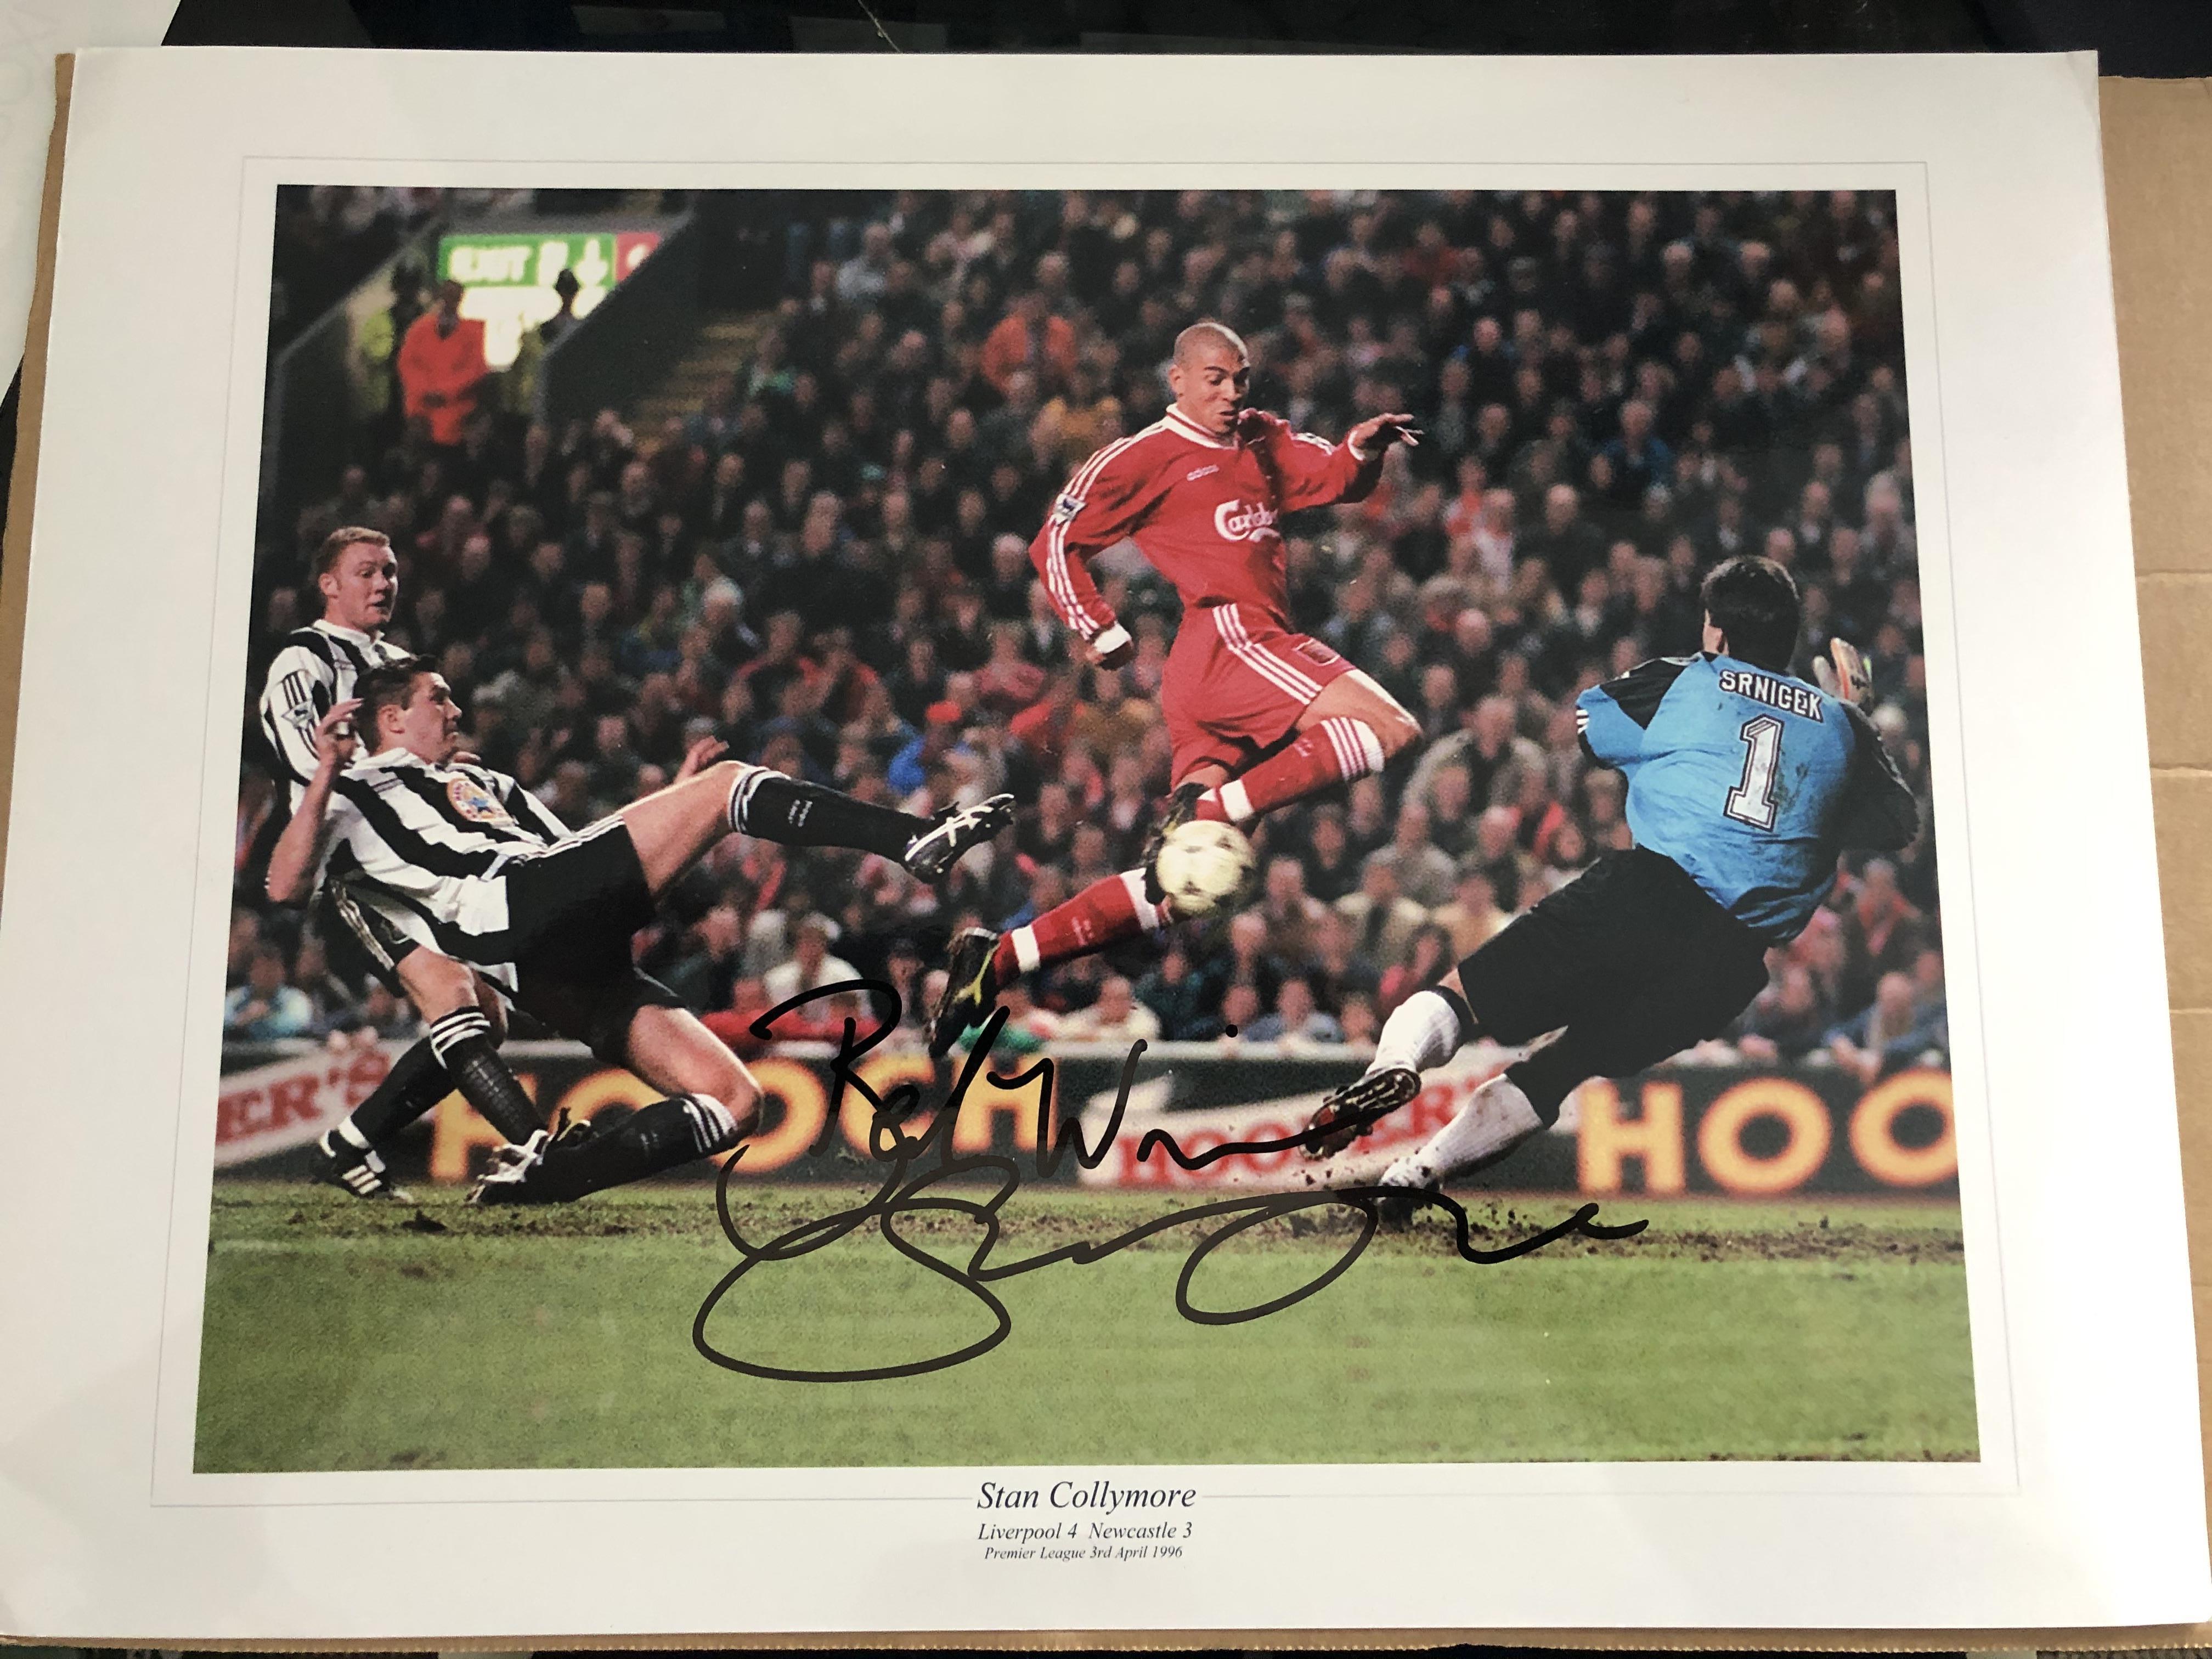 Lot 20 - 4 sporting photos signed, genuine signature.